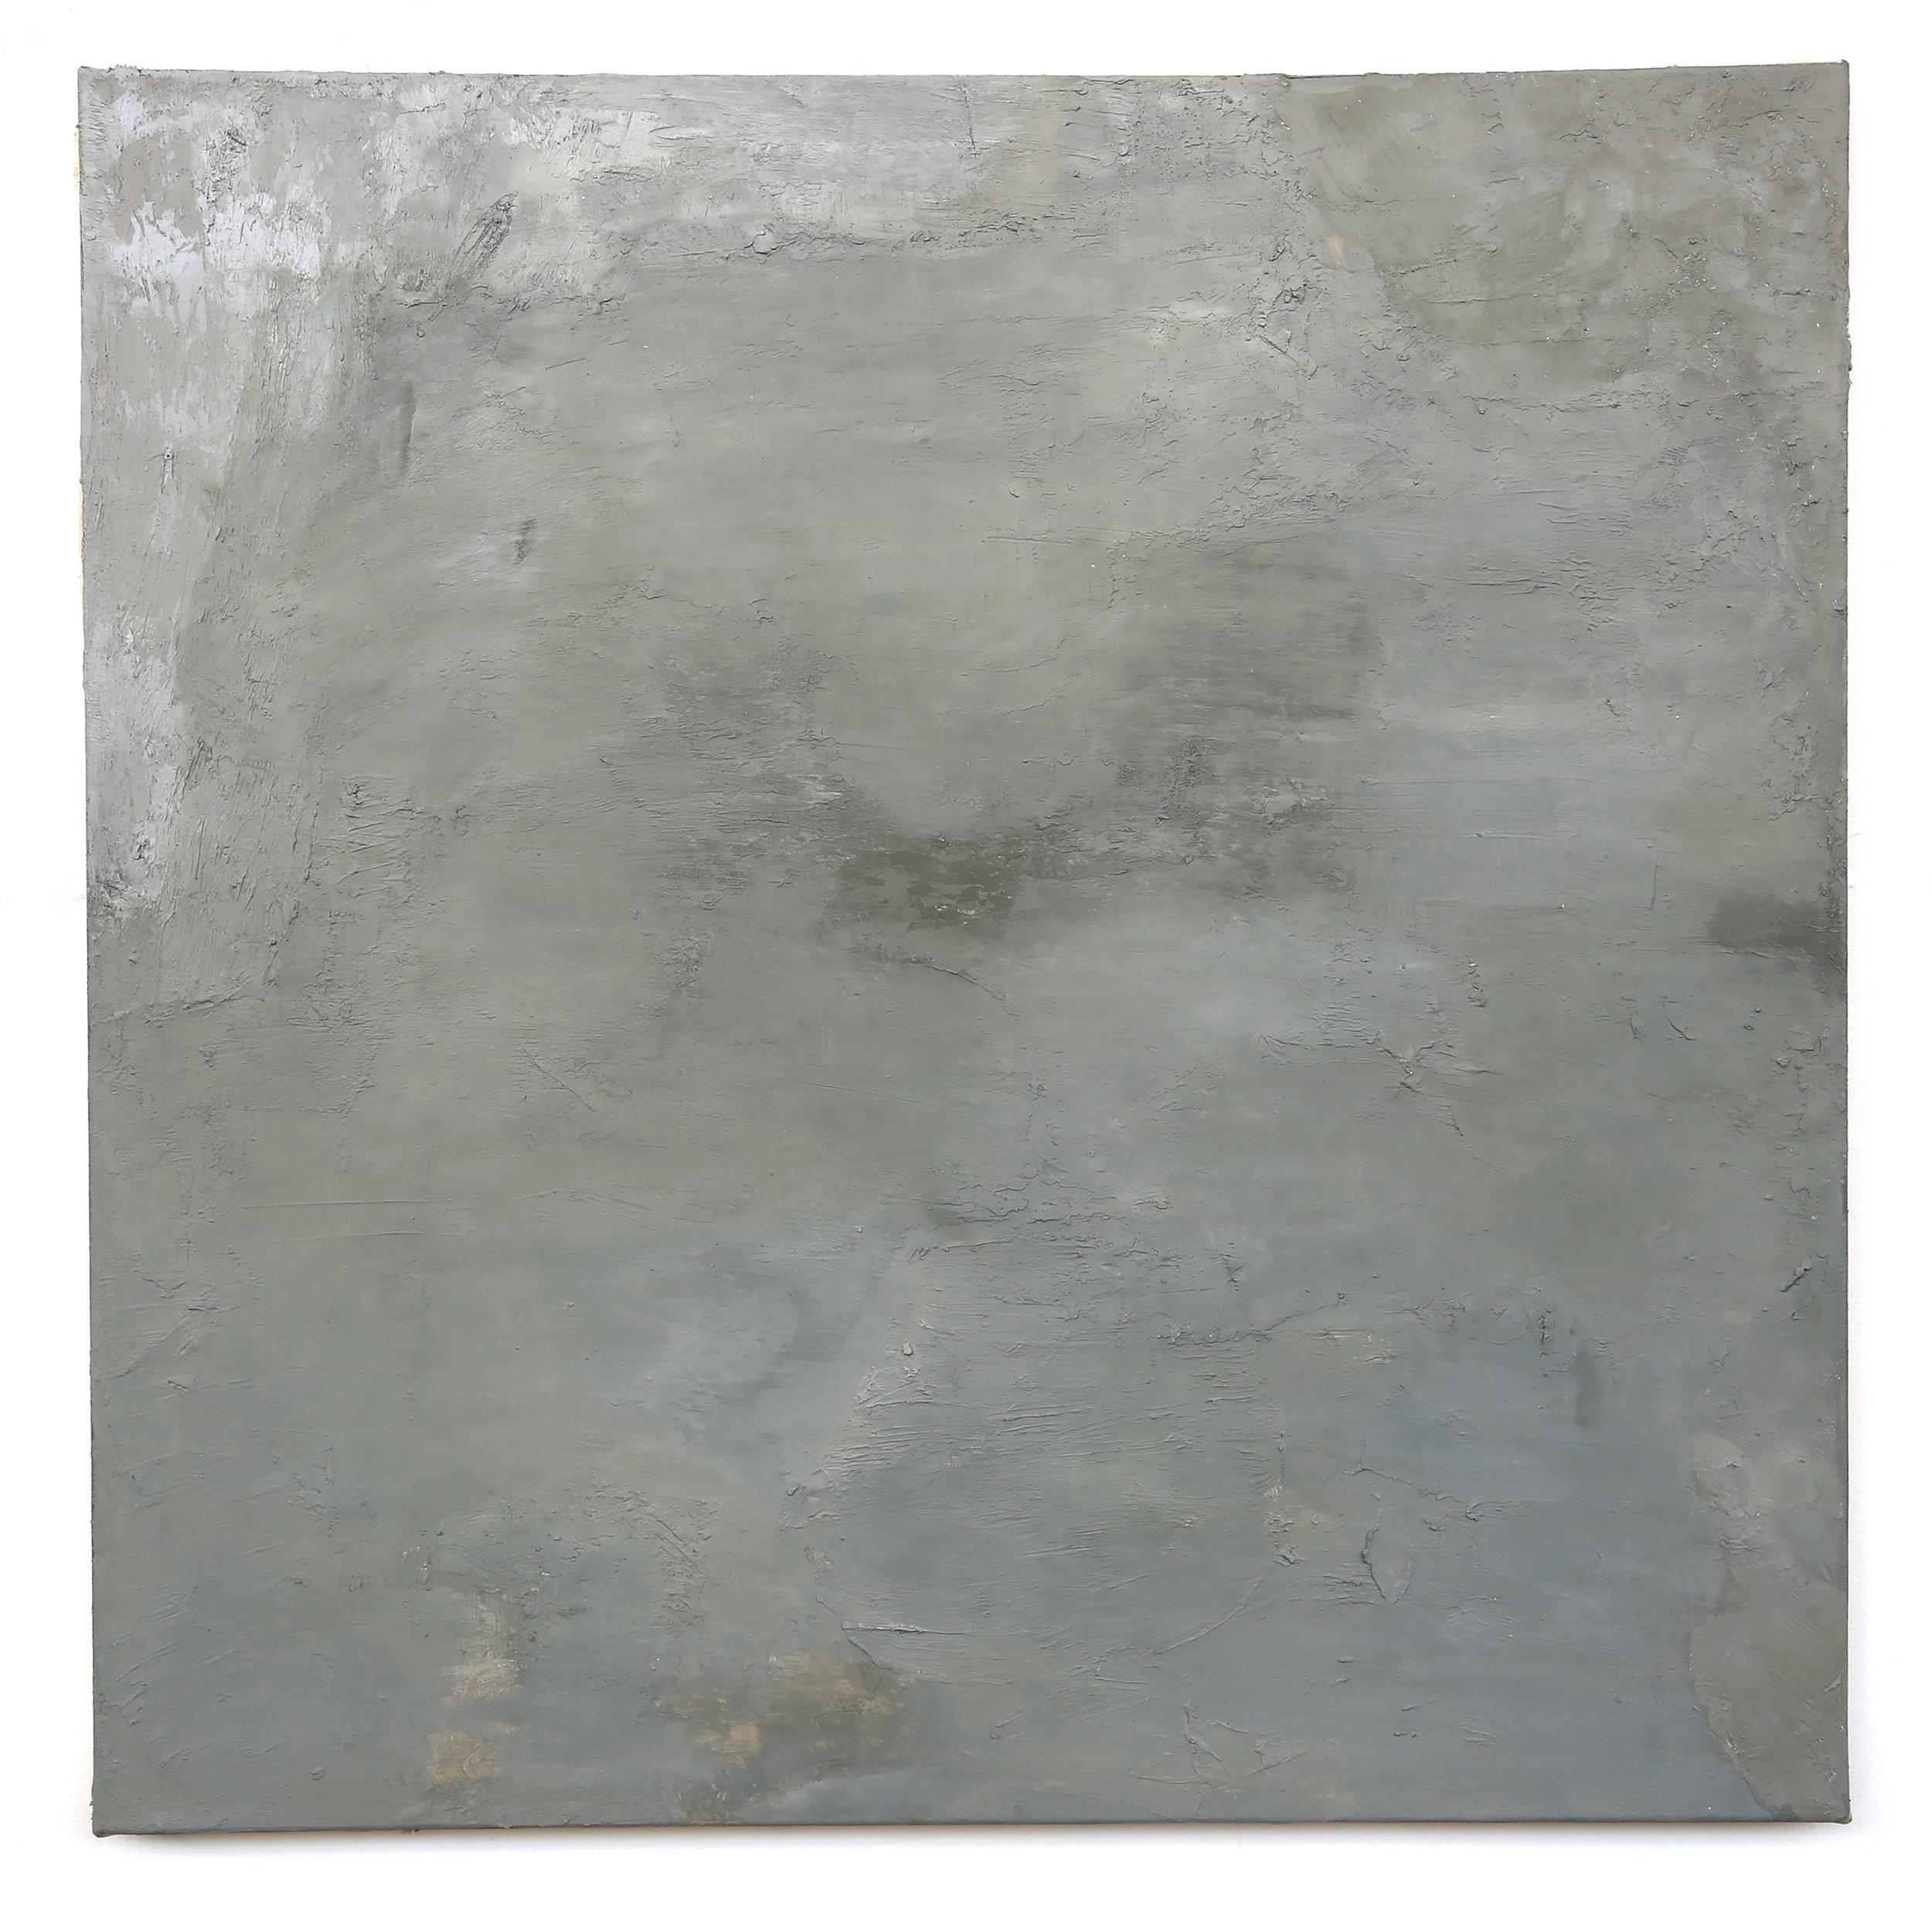 Concrete Slab #2